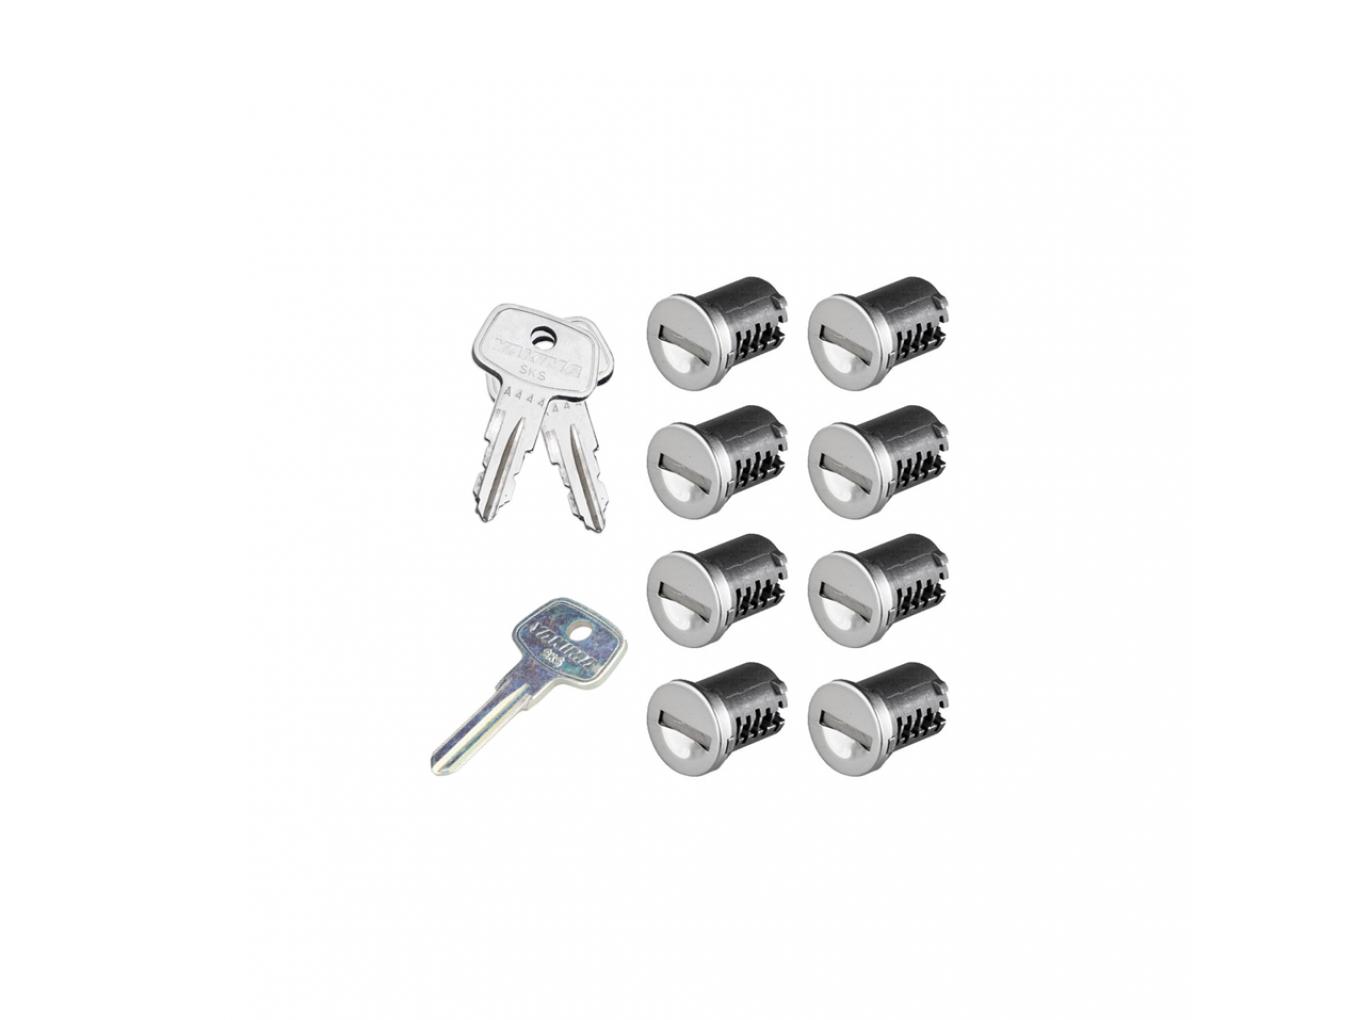 Yakima SKS Lock Cores - 8 Pack